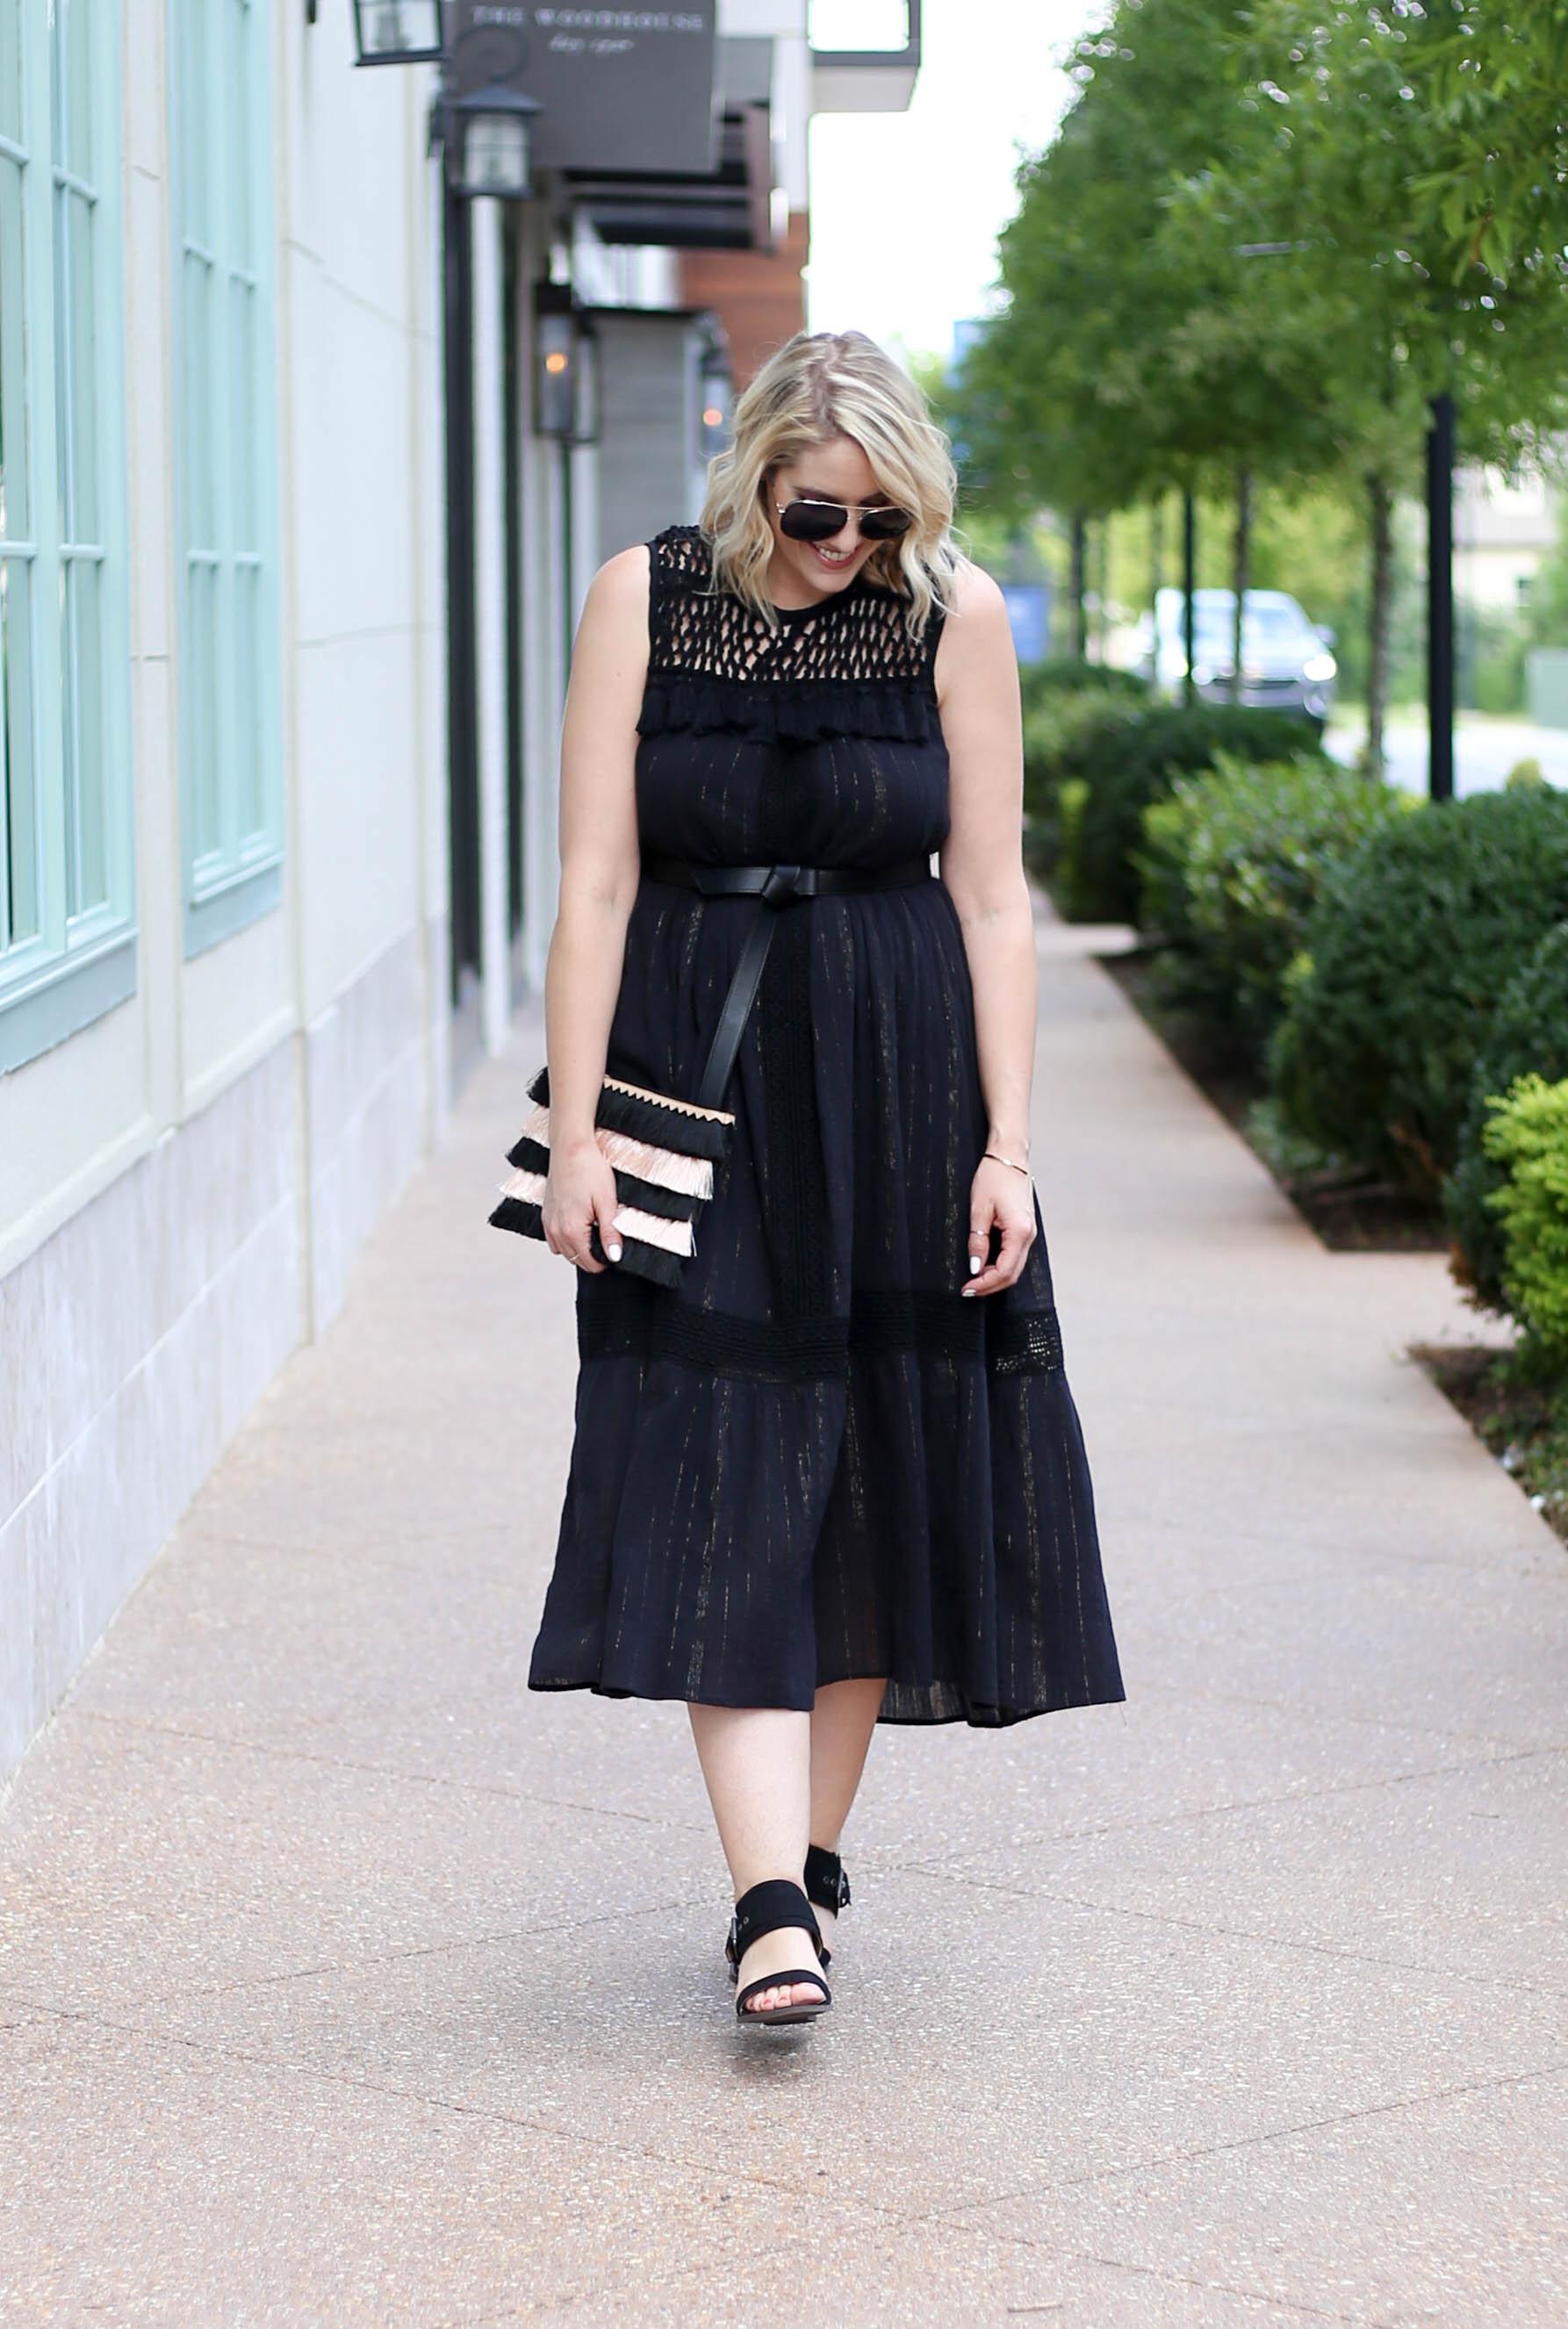 black boho midi dress #anthropologie #blackdress #lbd